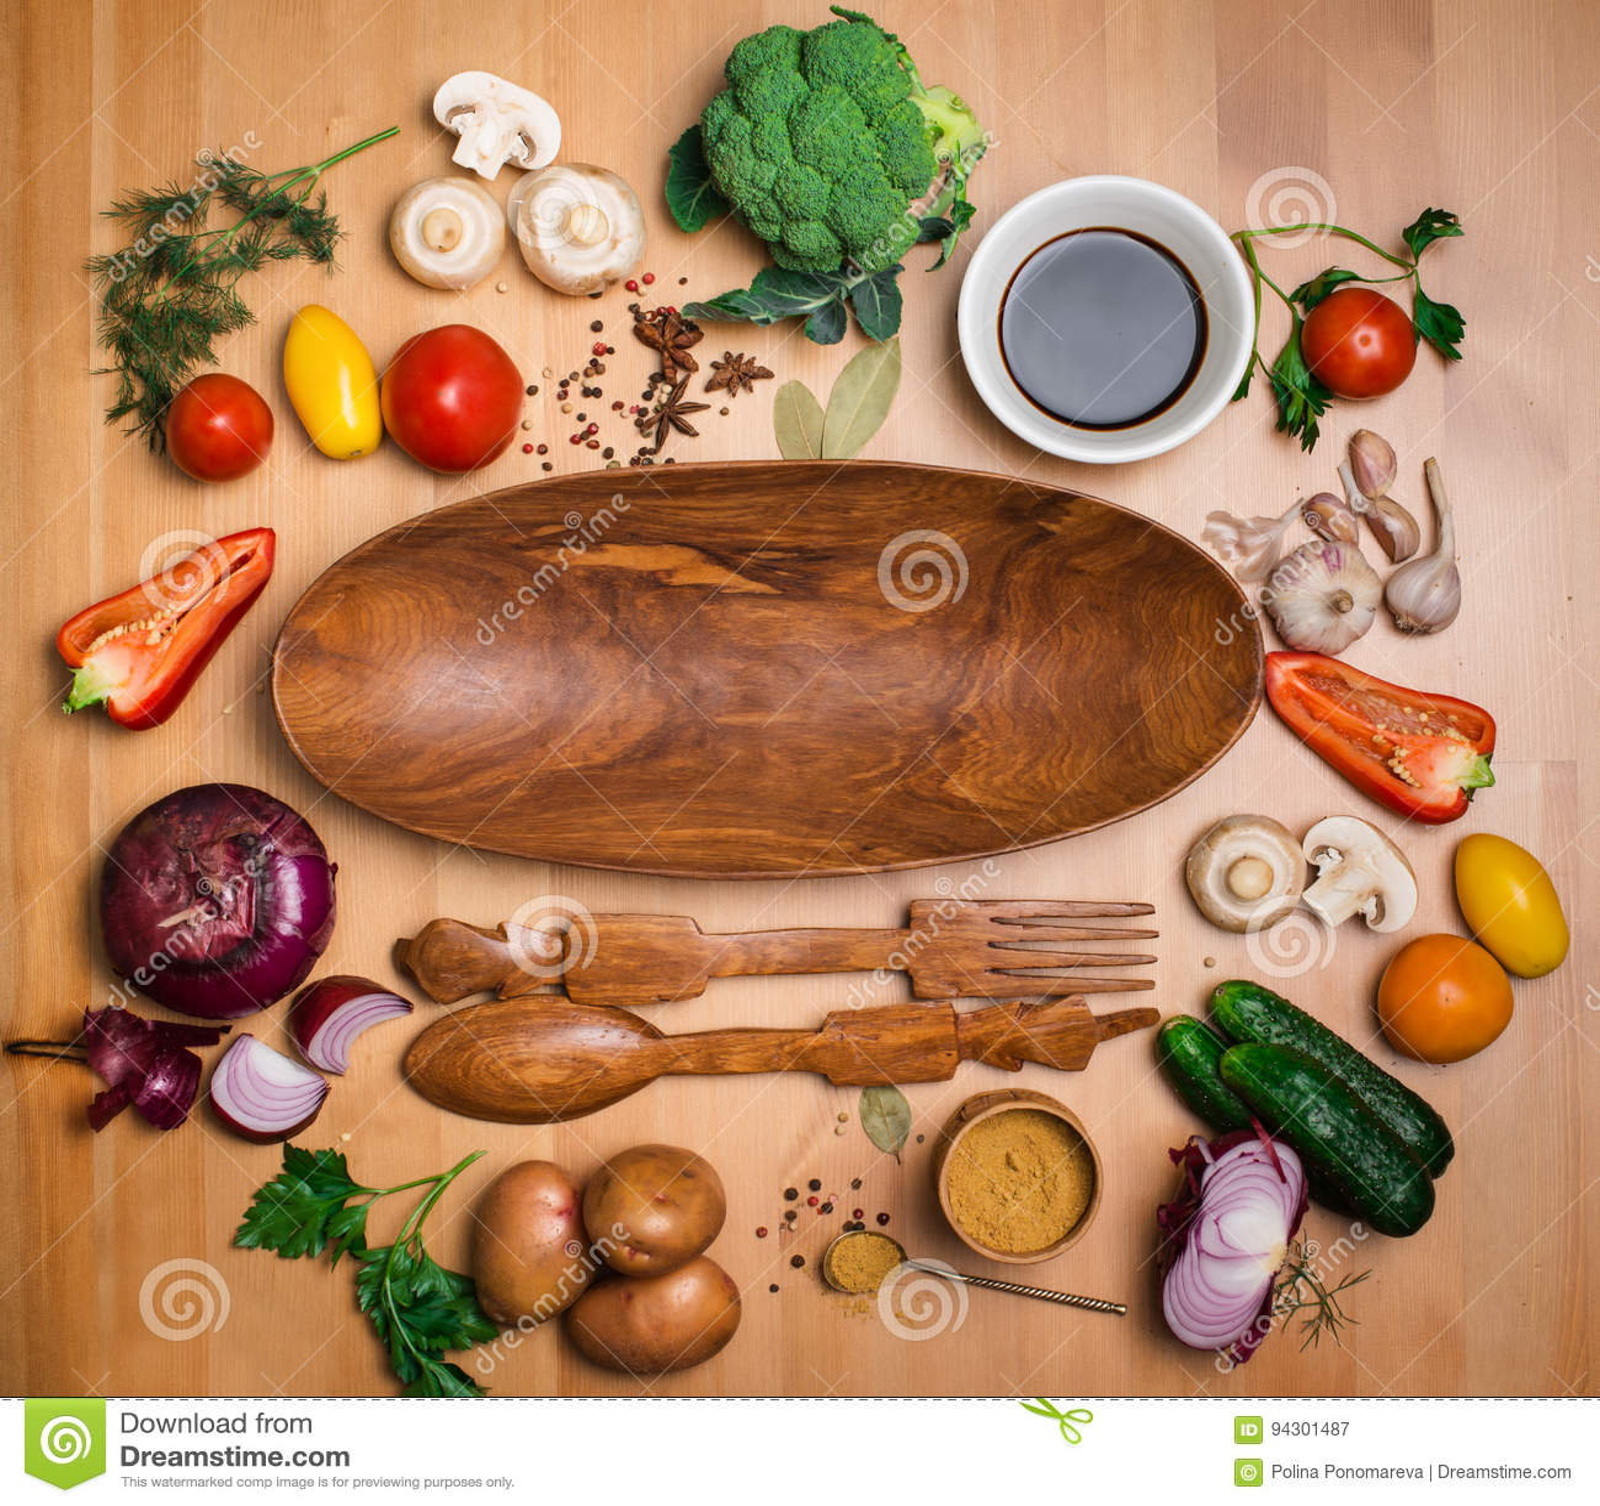 Fresh broccoli and vegetables ingredients for tasty vegetarian c